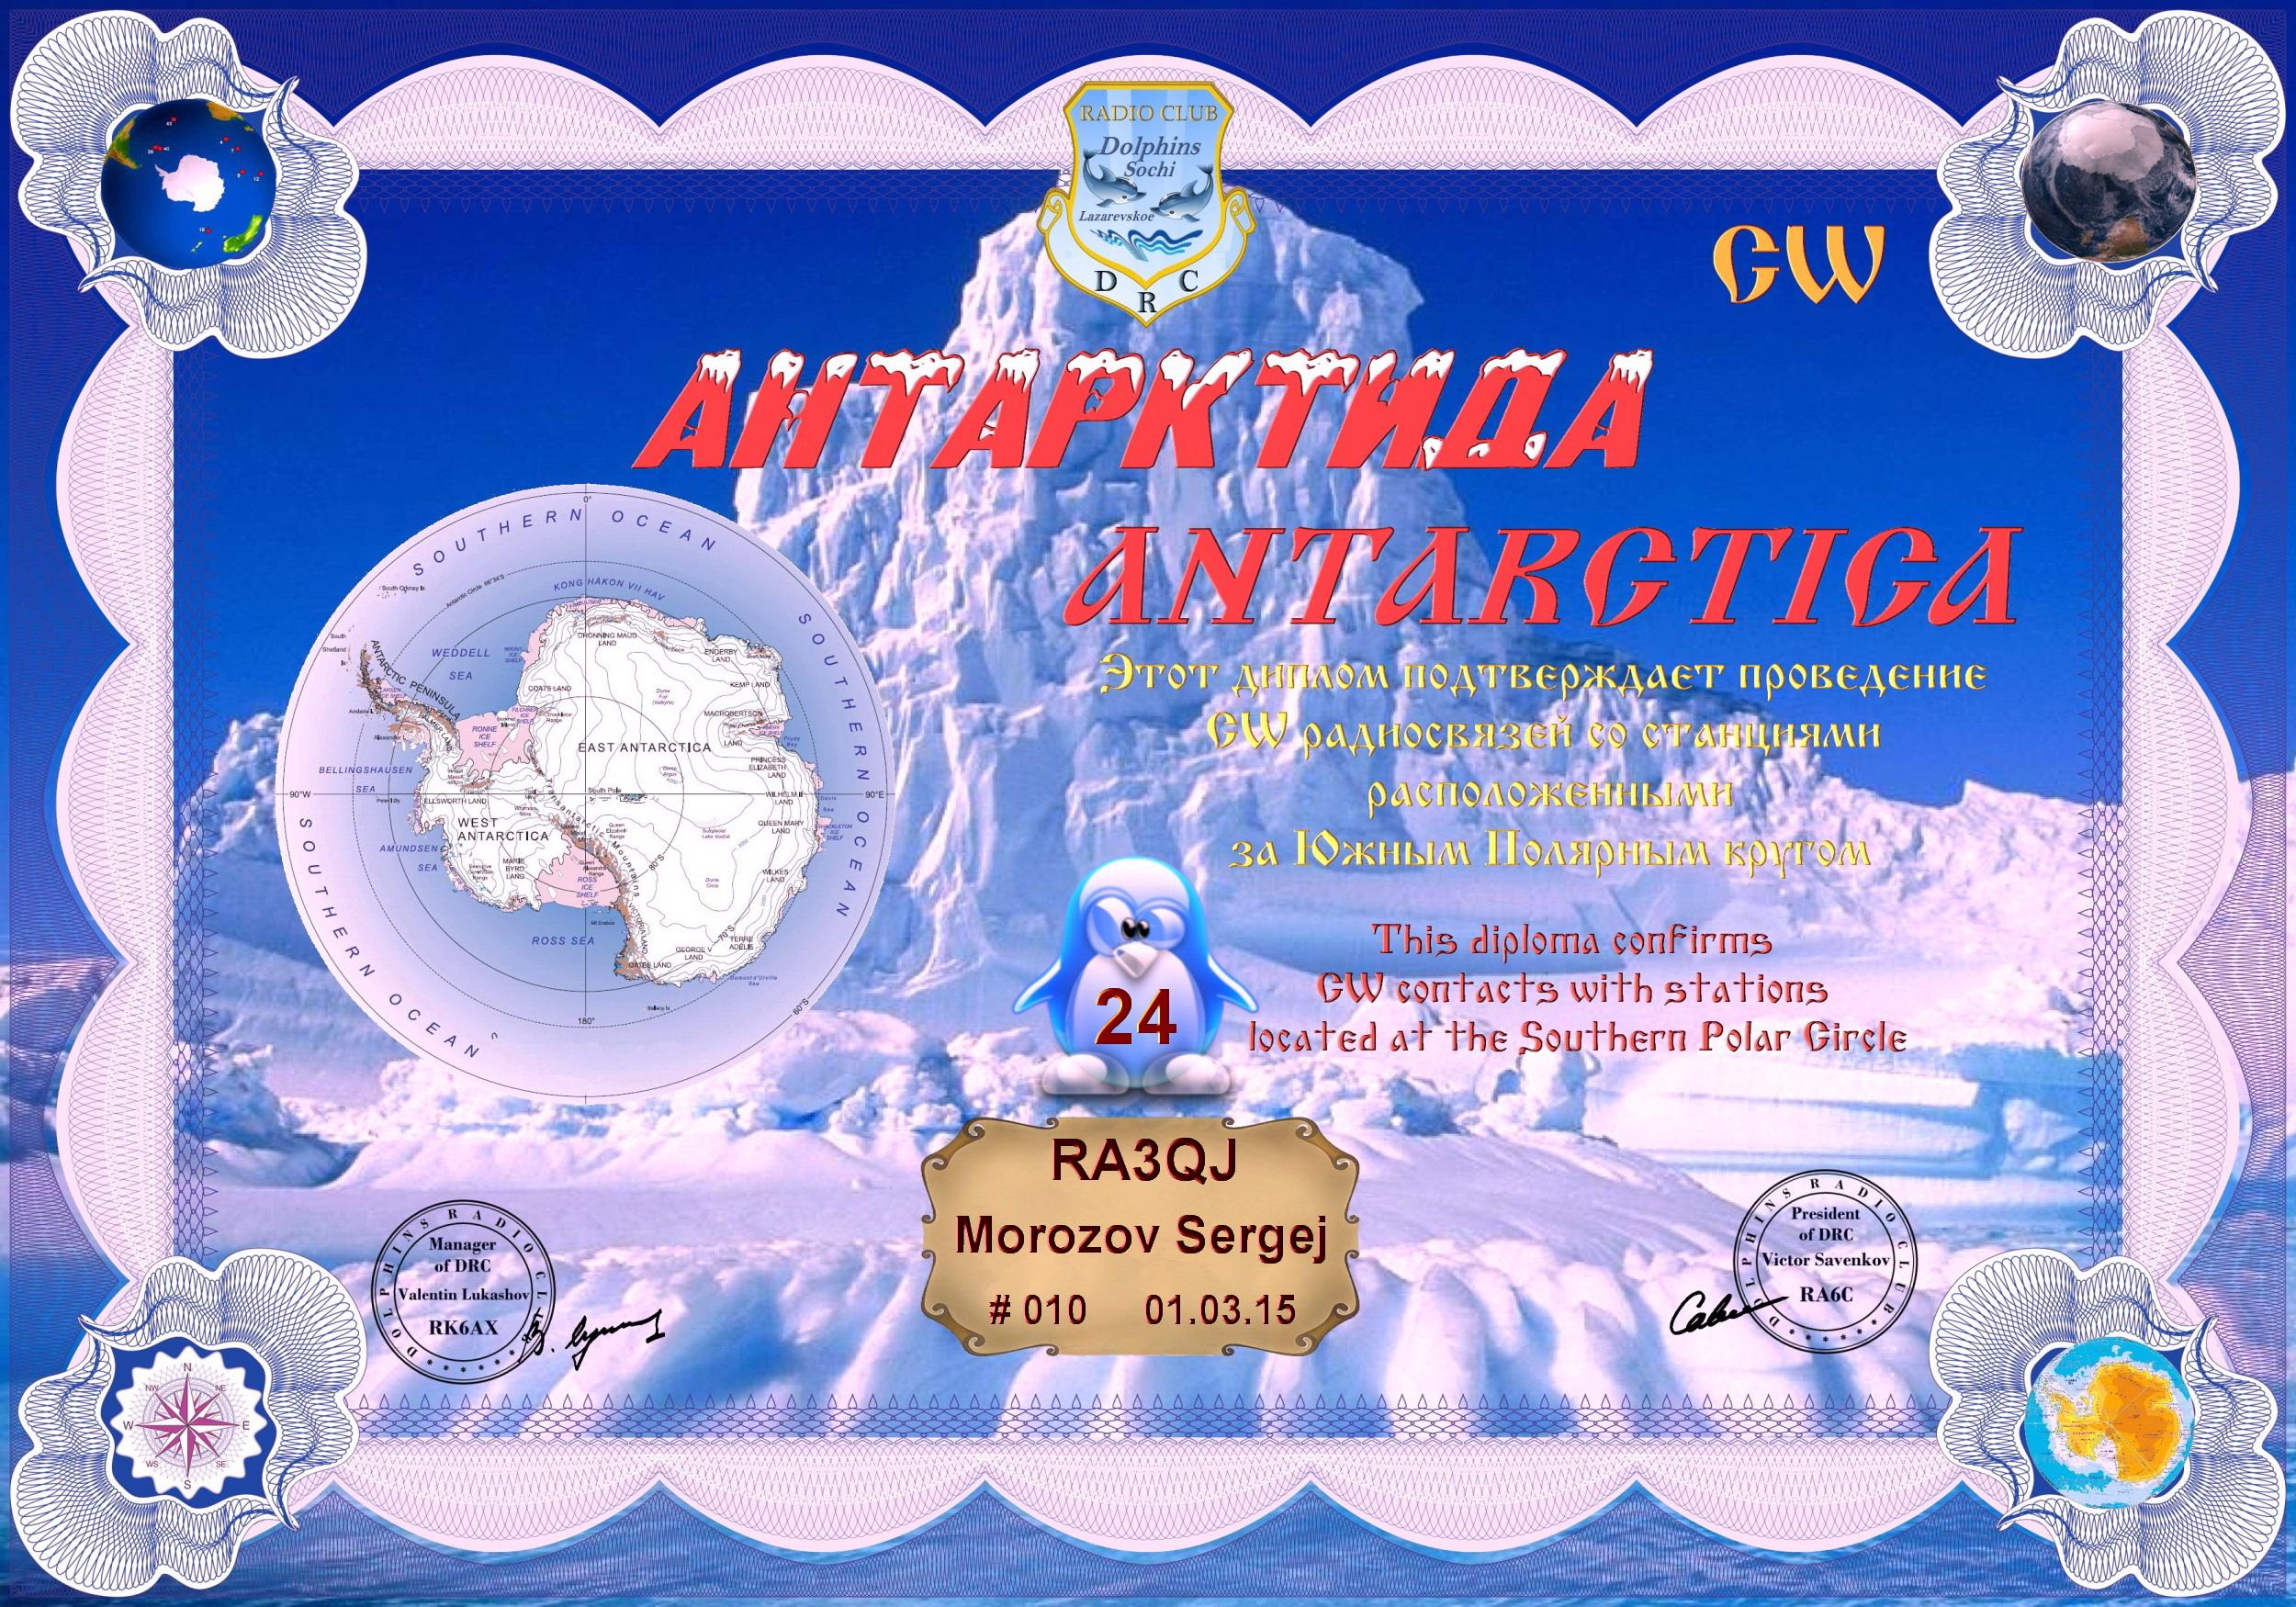 Нажмите на изображение для увеличения.  Название:Антарктида 24 CW.jpg Просмотров:58 Размер:1.89 Мб ID:135425